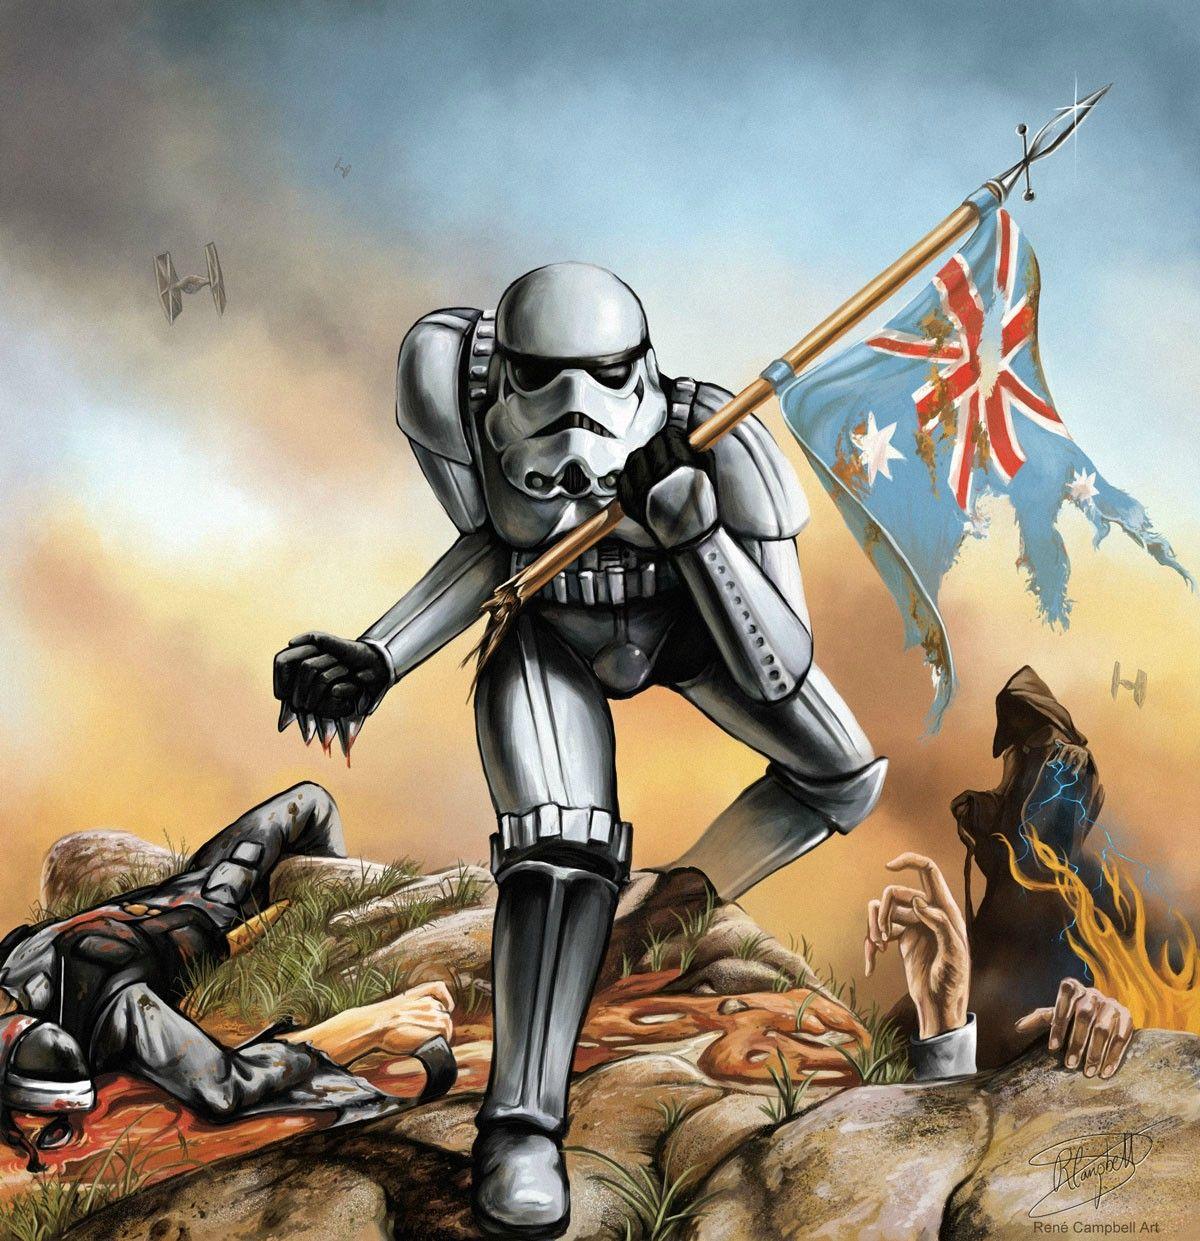 Iron Trooper Iron Maiden Star Wars Mashup Drawn For A Commission R Idap Star Wars Humor Iron Maiden The Trooper Iron Maiden